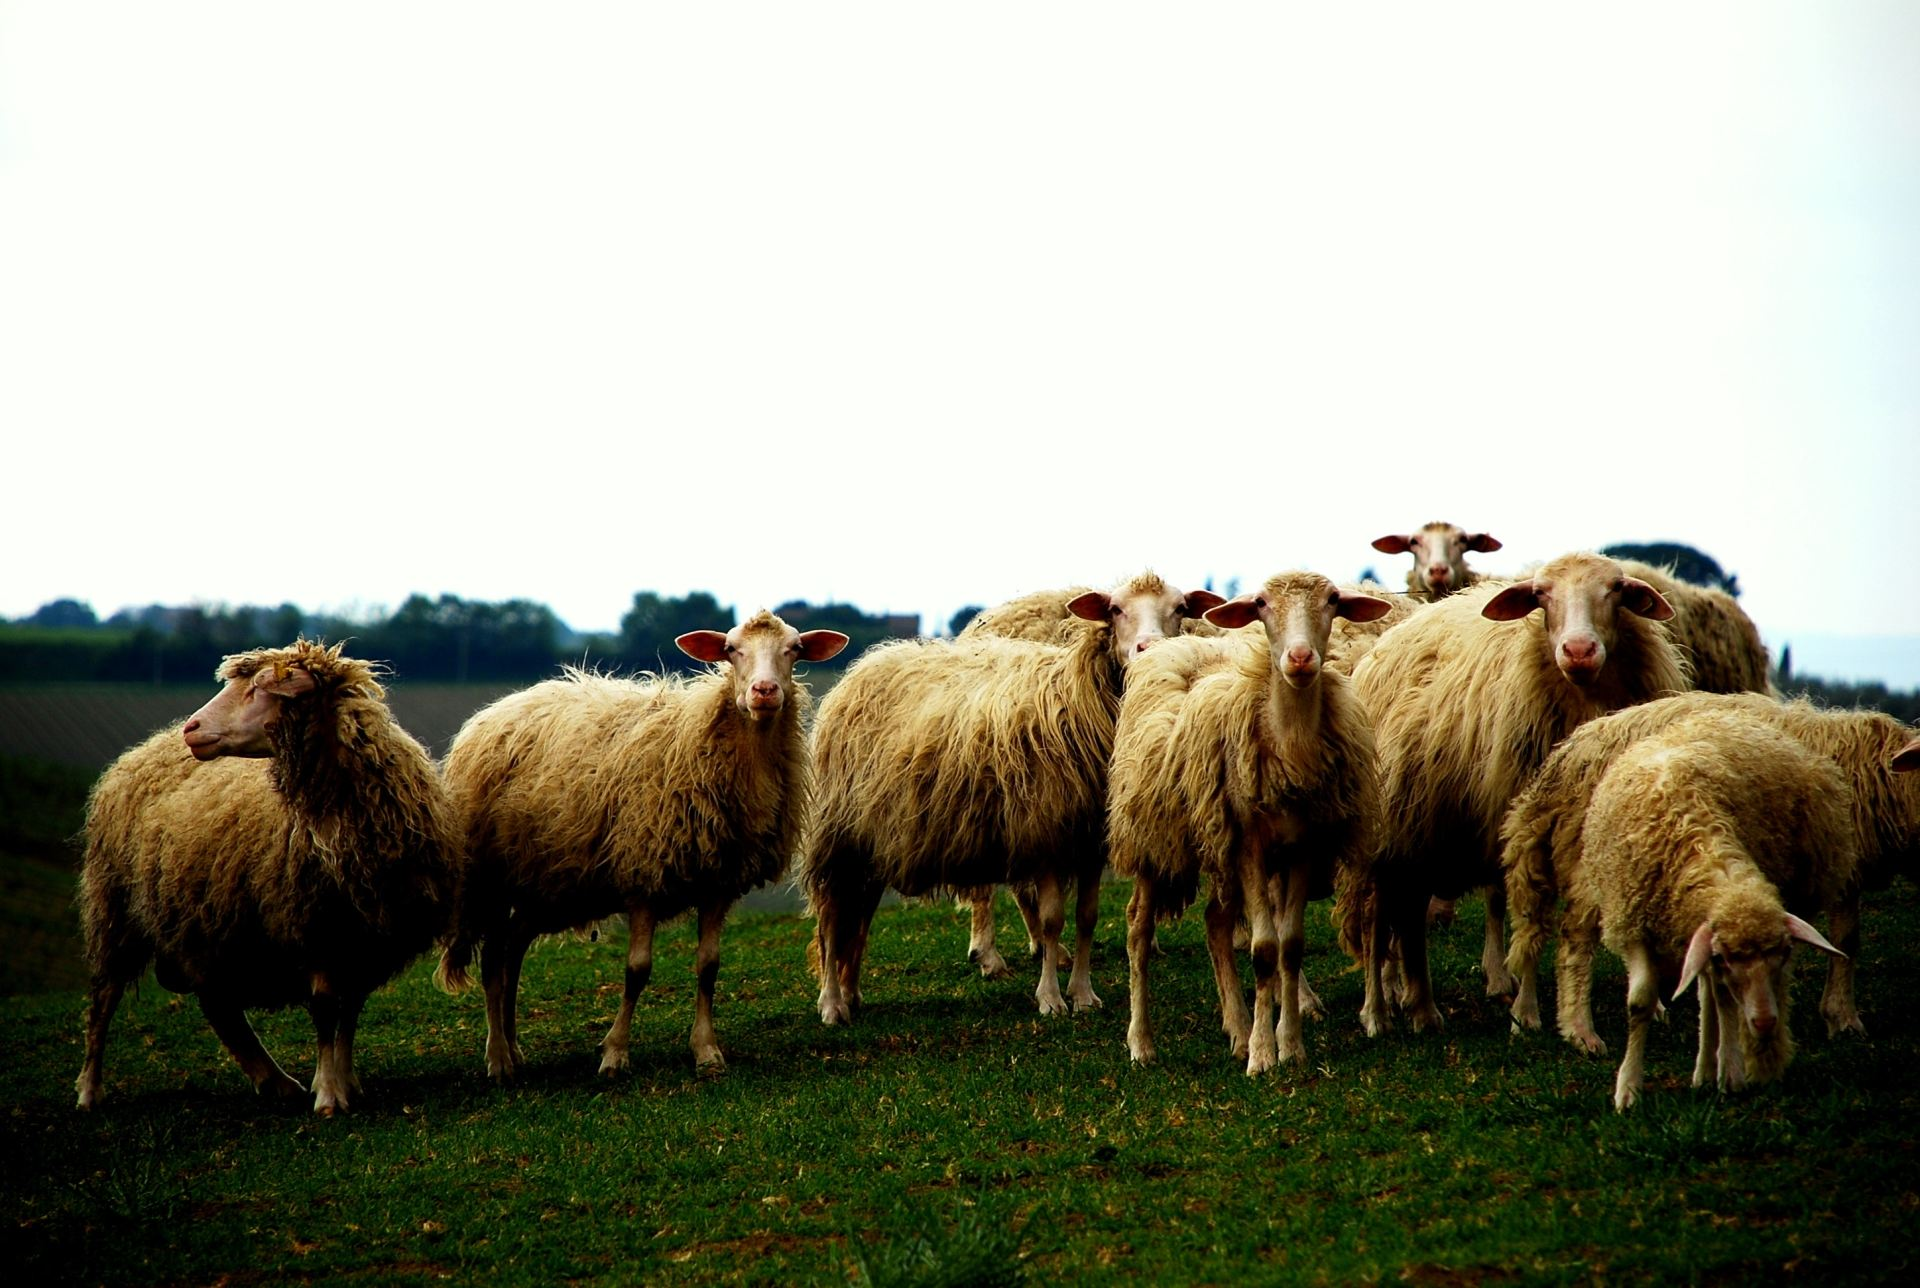 Beaux moutons